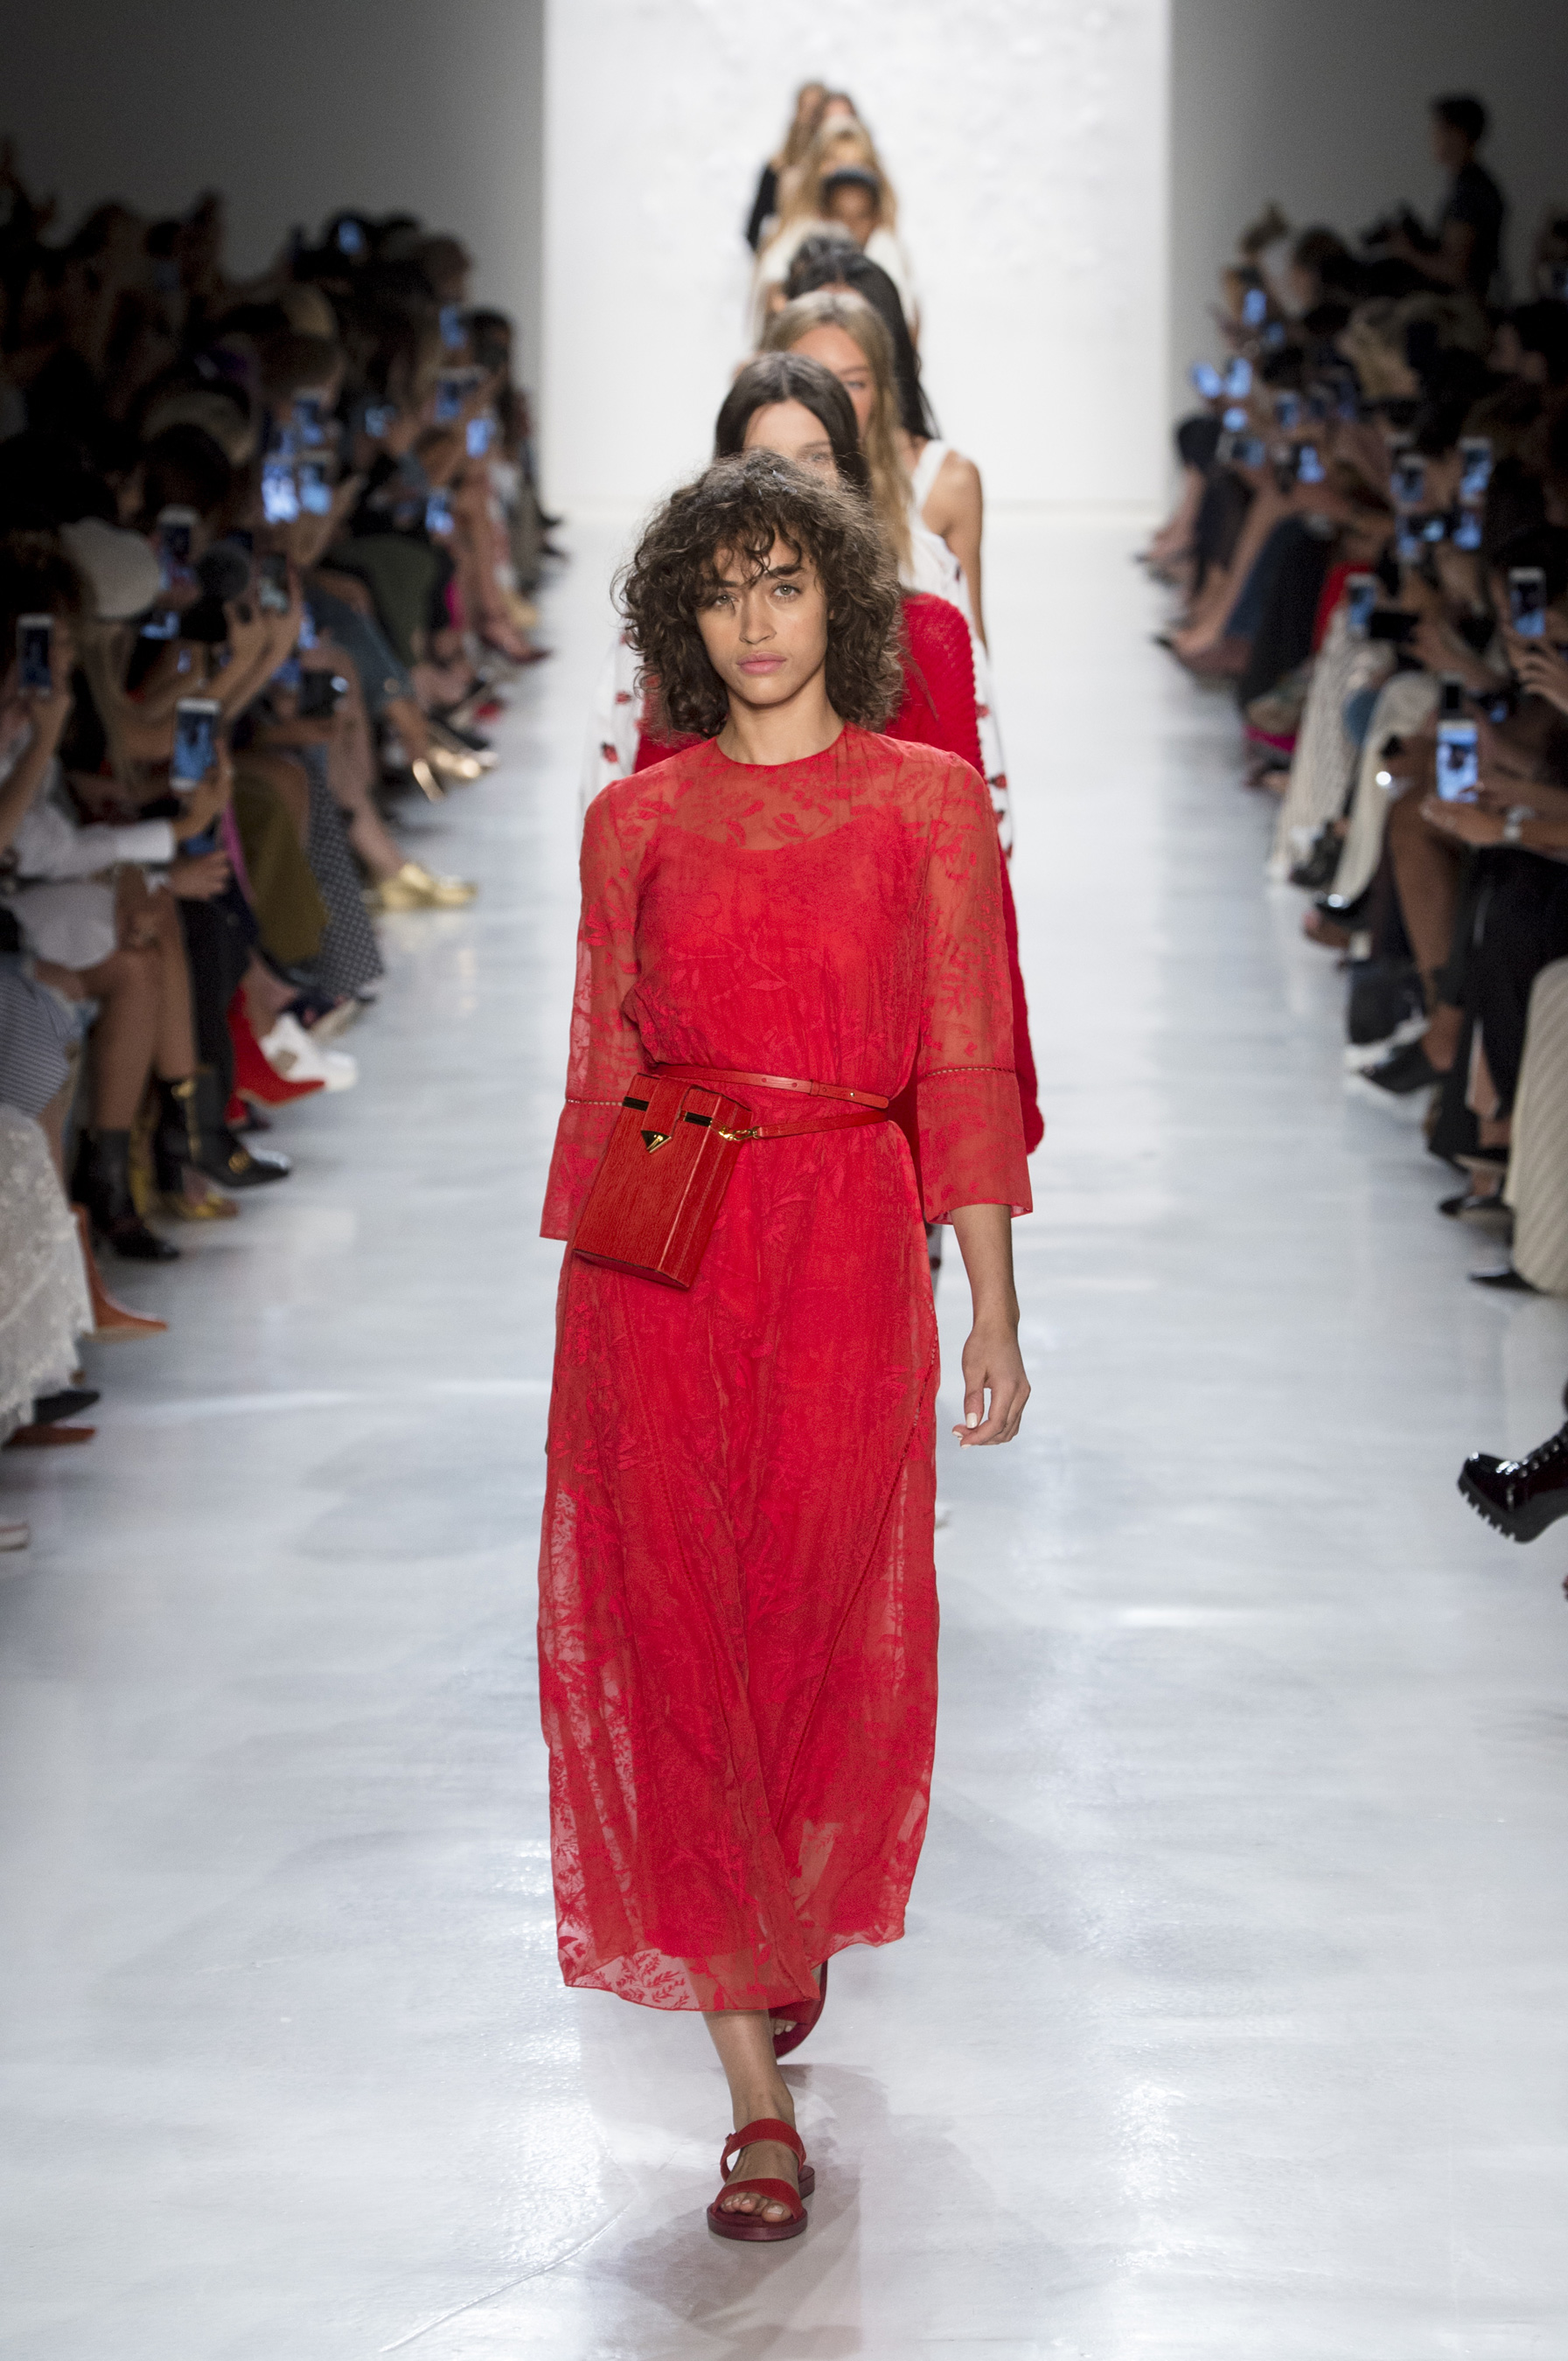 Vogue Arabia Arabian Fashion, Arabian Beauty Trends 28